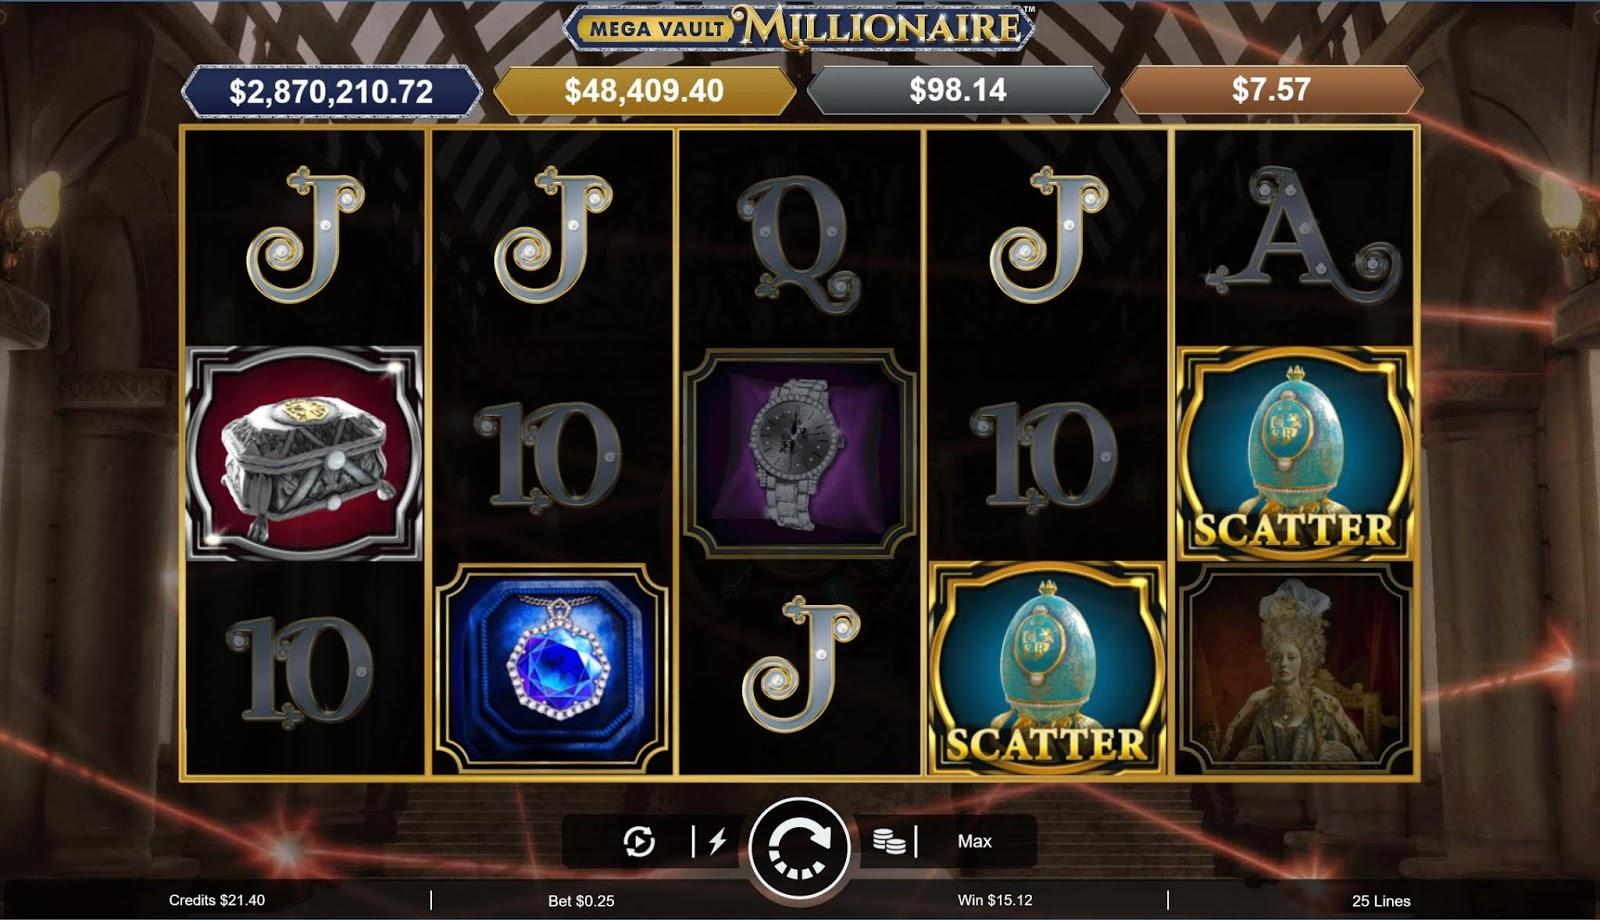 Slots Millions Slots Festival - Casino Promo is Here